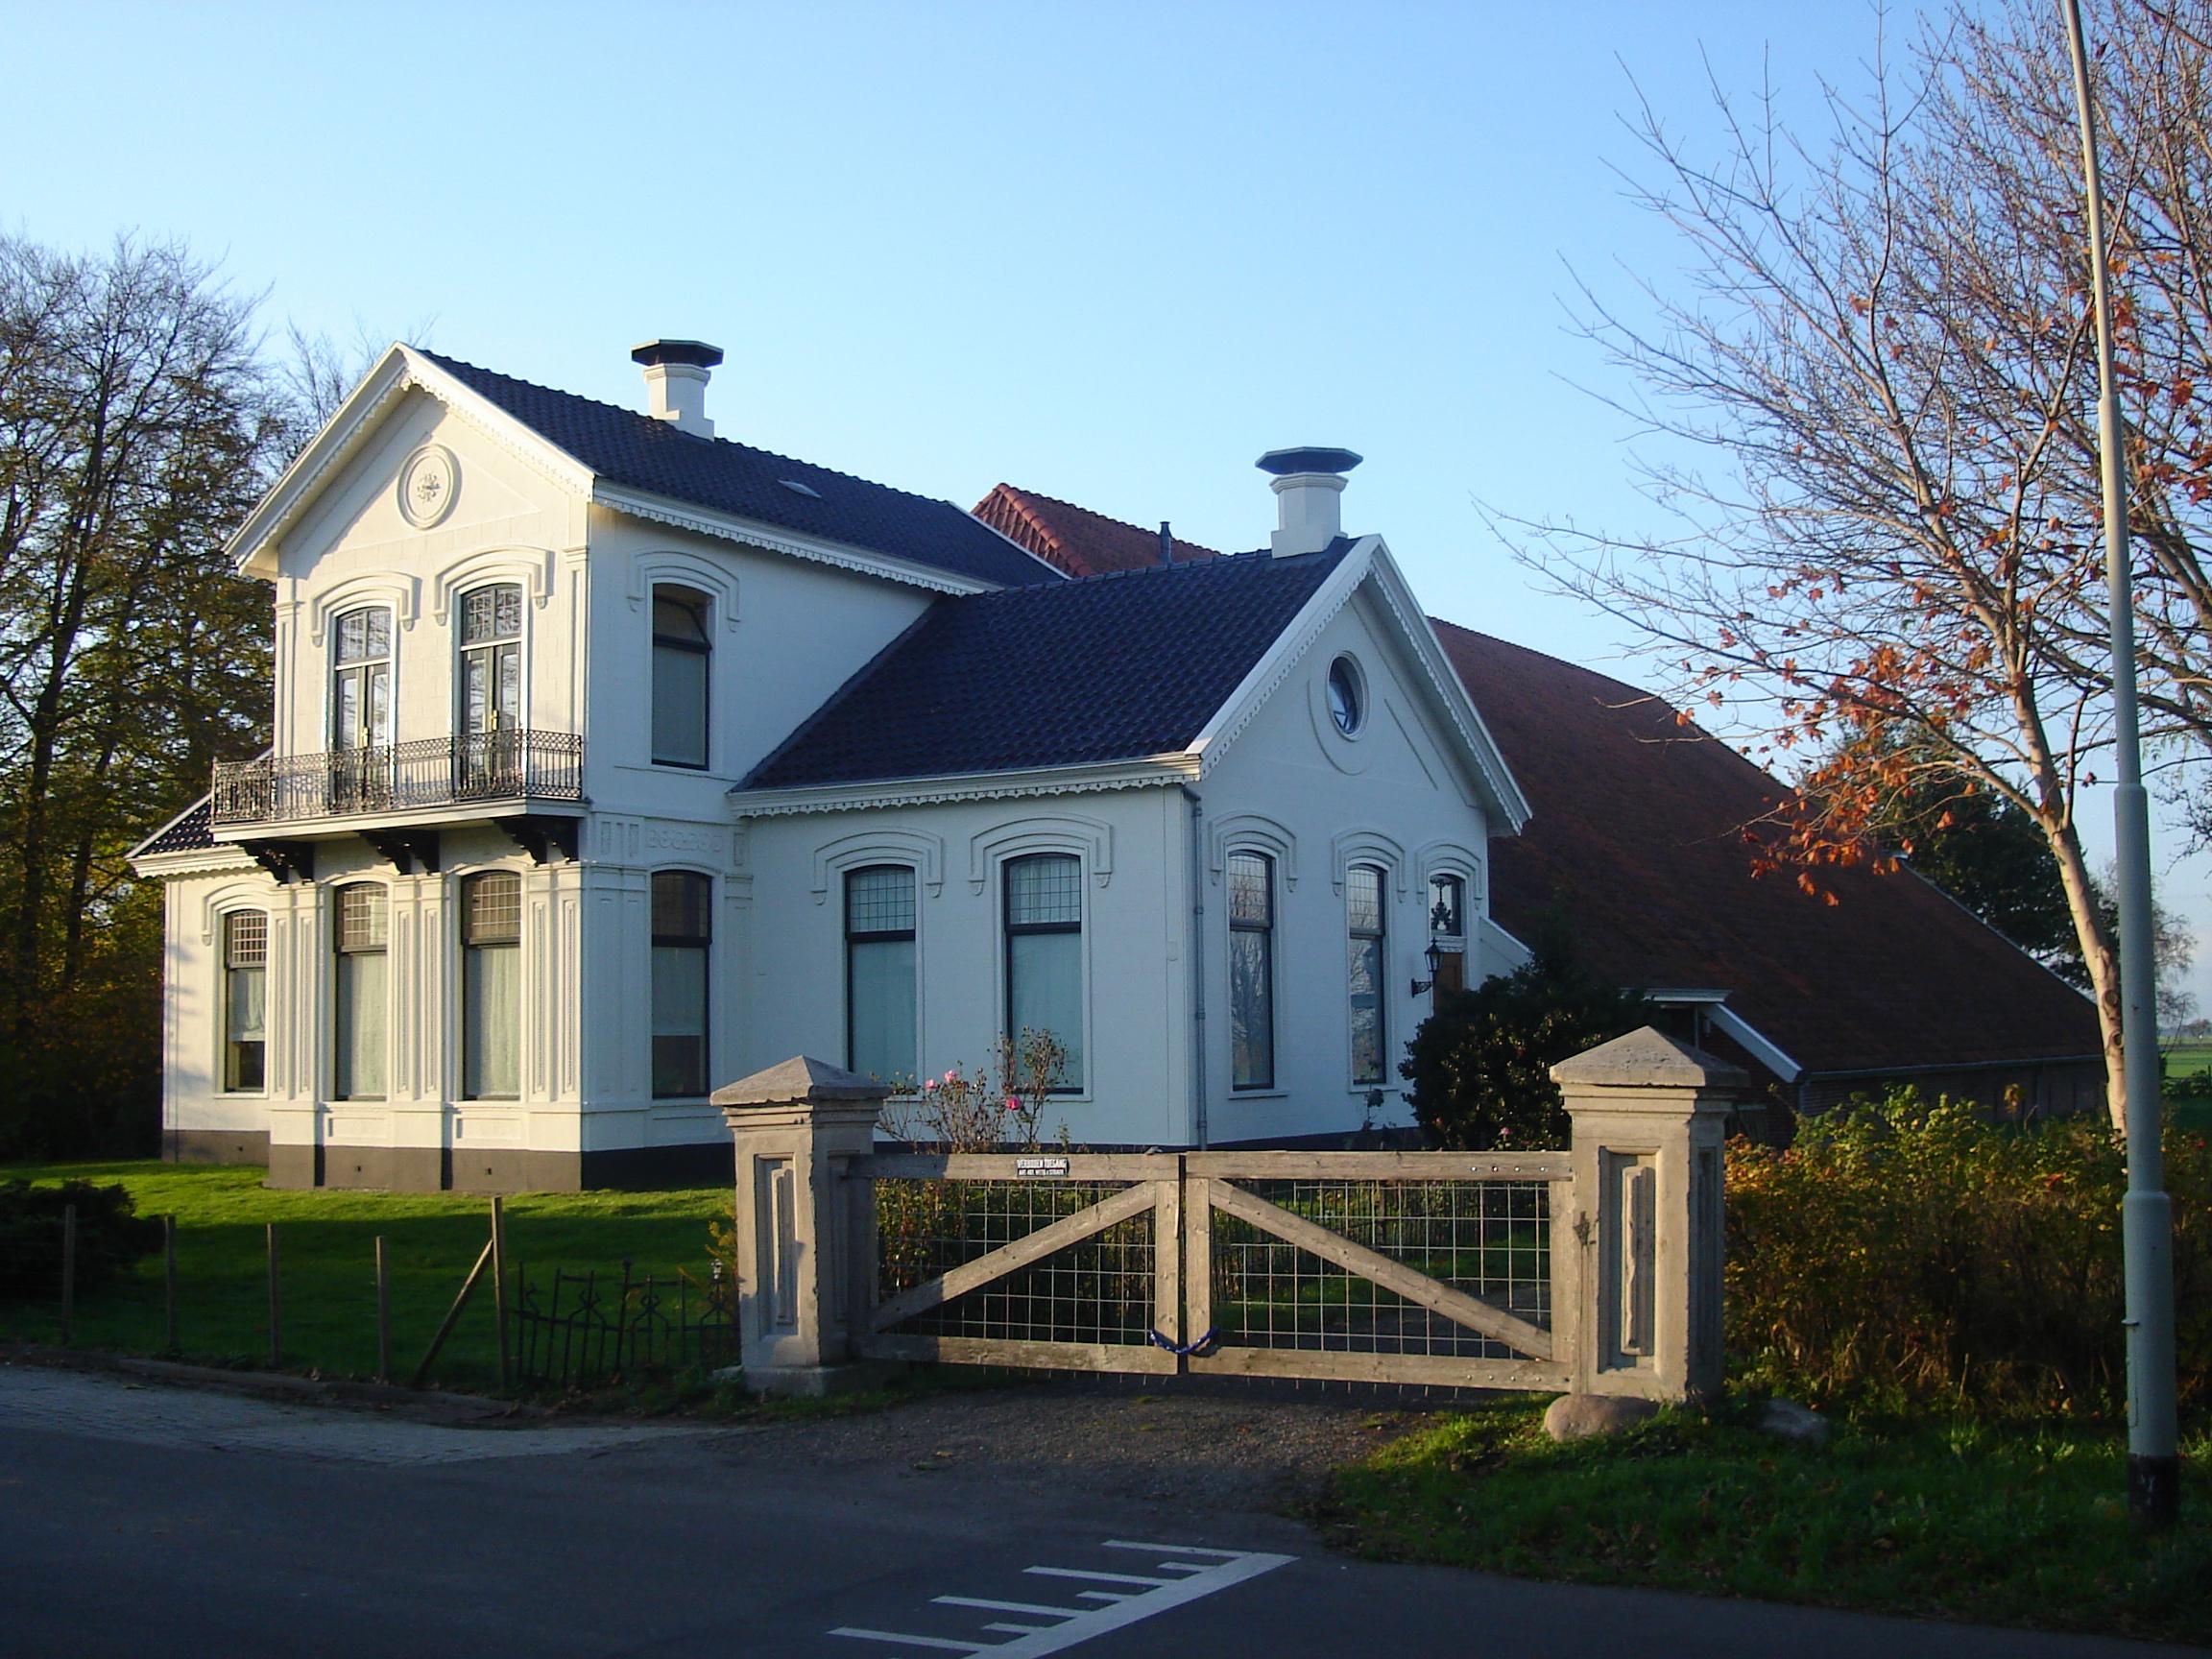 Bestand farmhouse oosterstraat scheemda netherlands jpg for Farm house netherlands